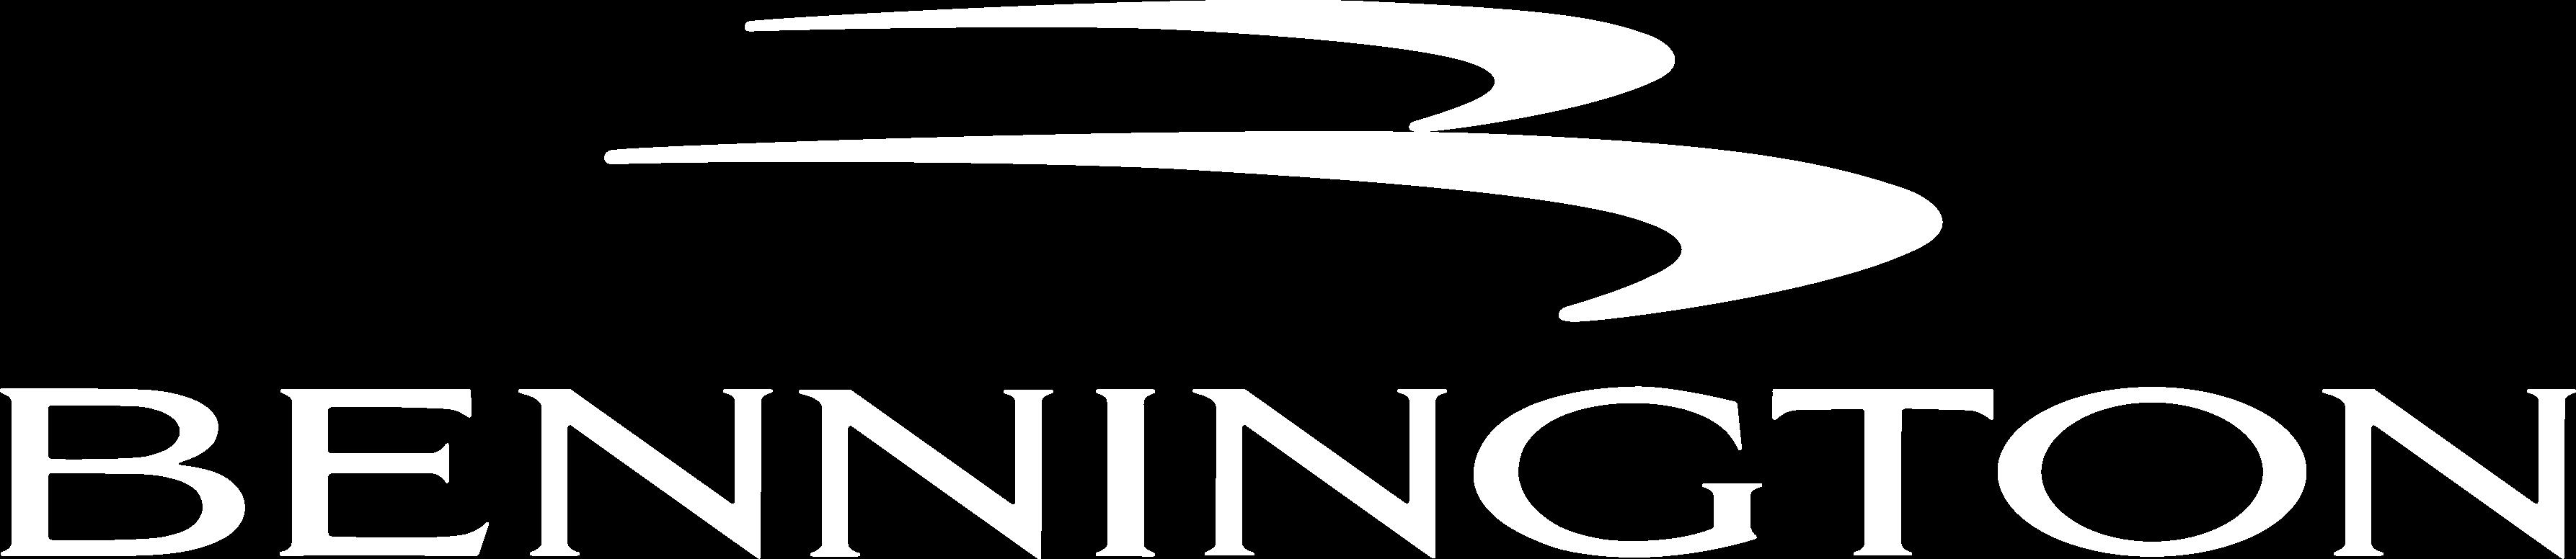 Bennington Wiring Diagram from club.benningtonmarine.com